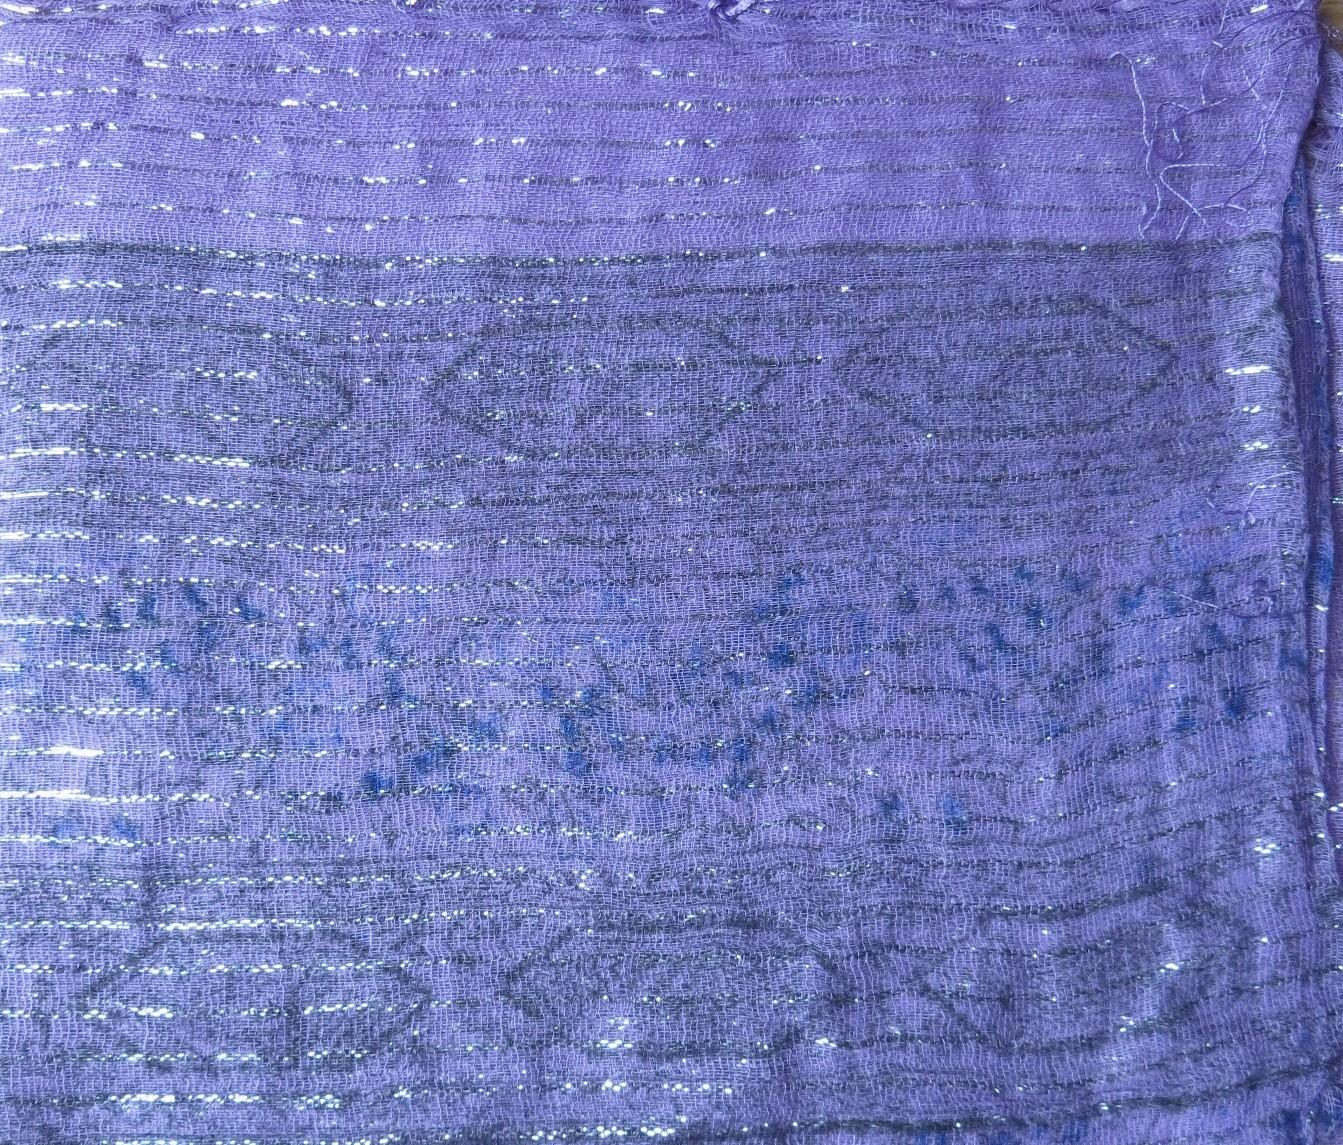 Lavender lurex tichel with blue berry flowers